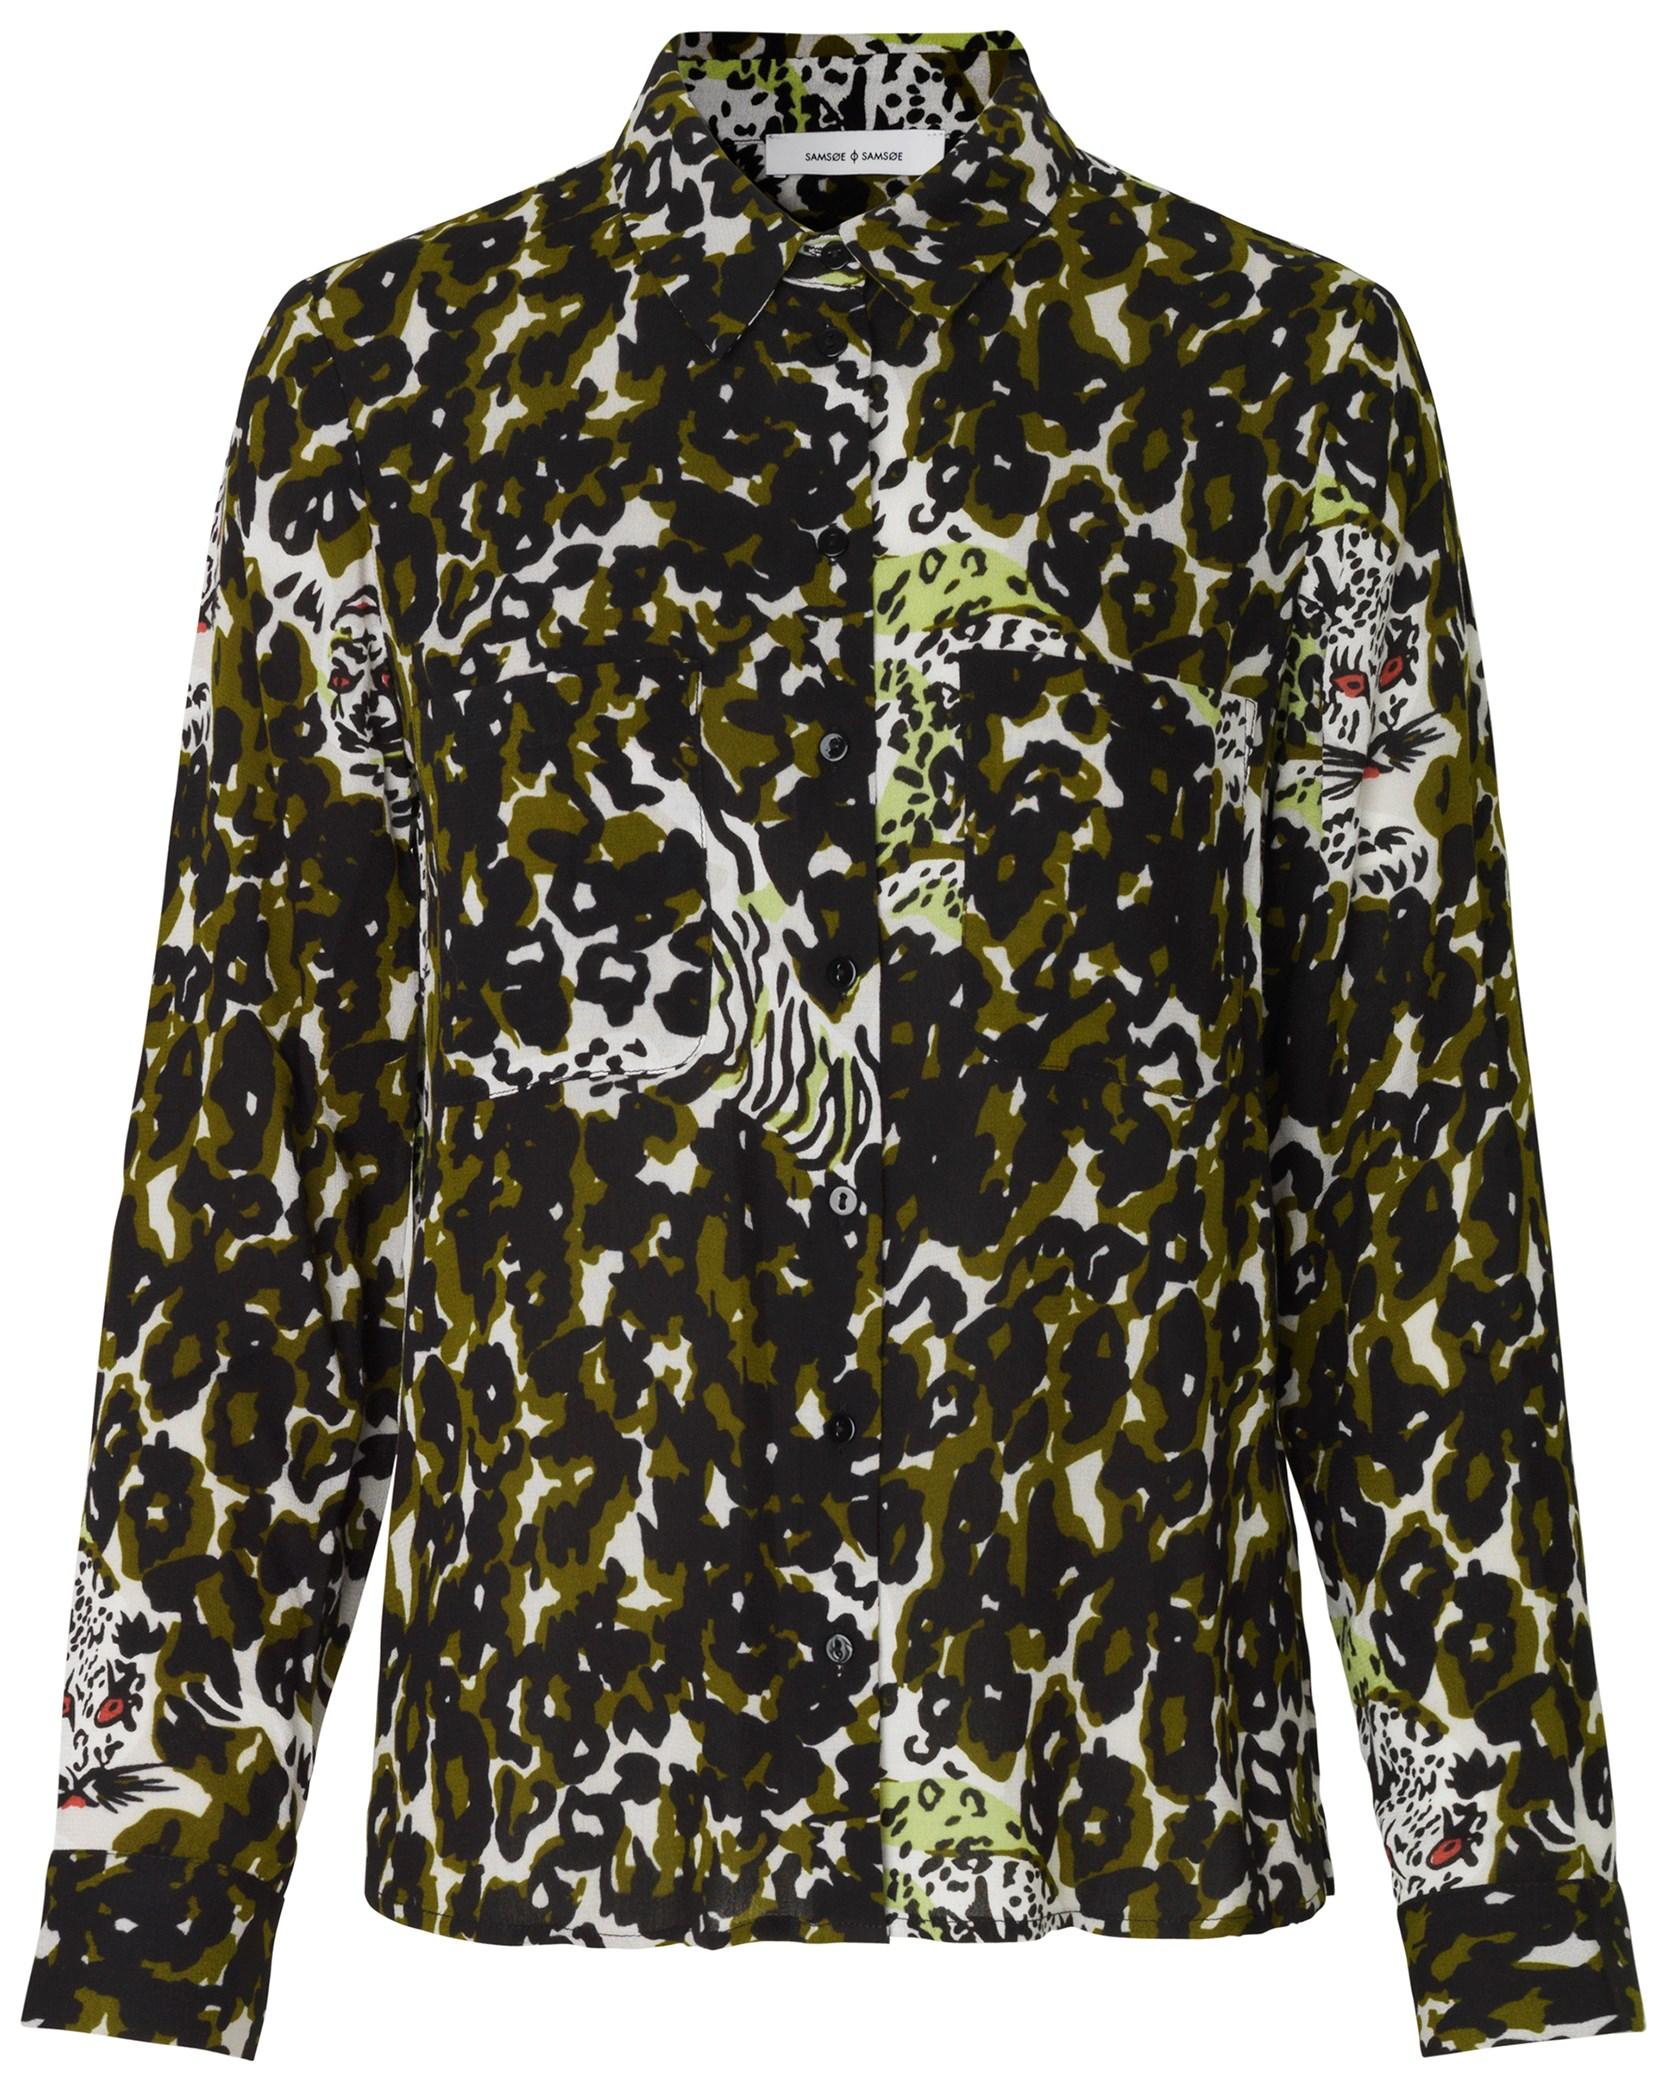 651a3d4143c4 Samsøe and Samsøe. Milly Shirt aop 7201 ...